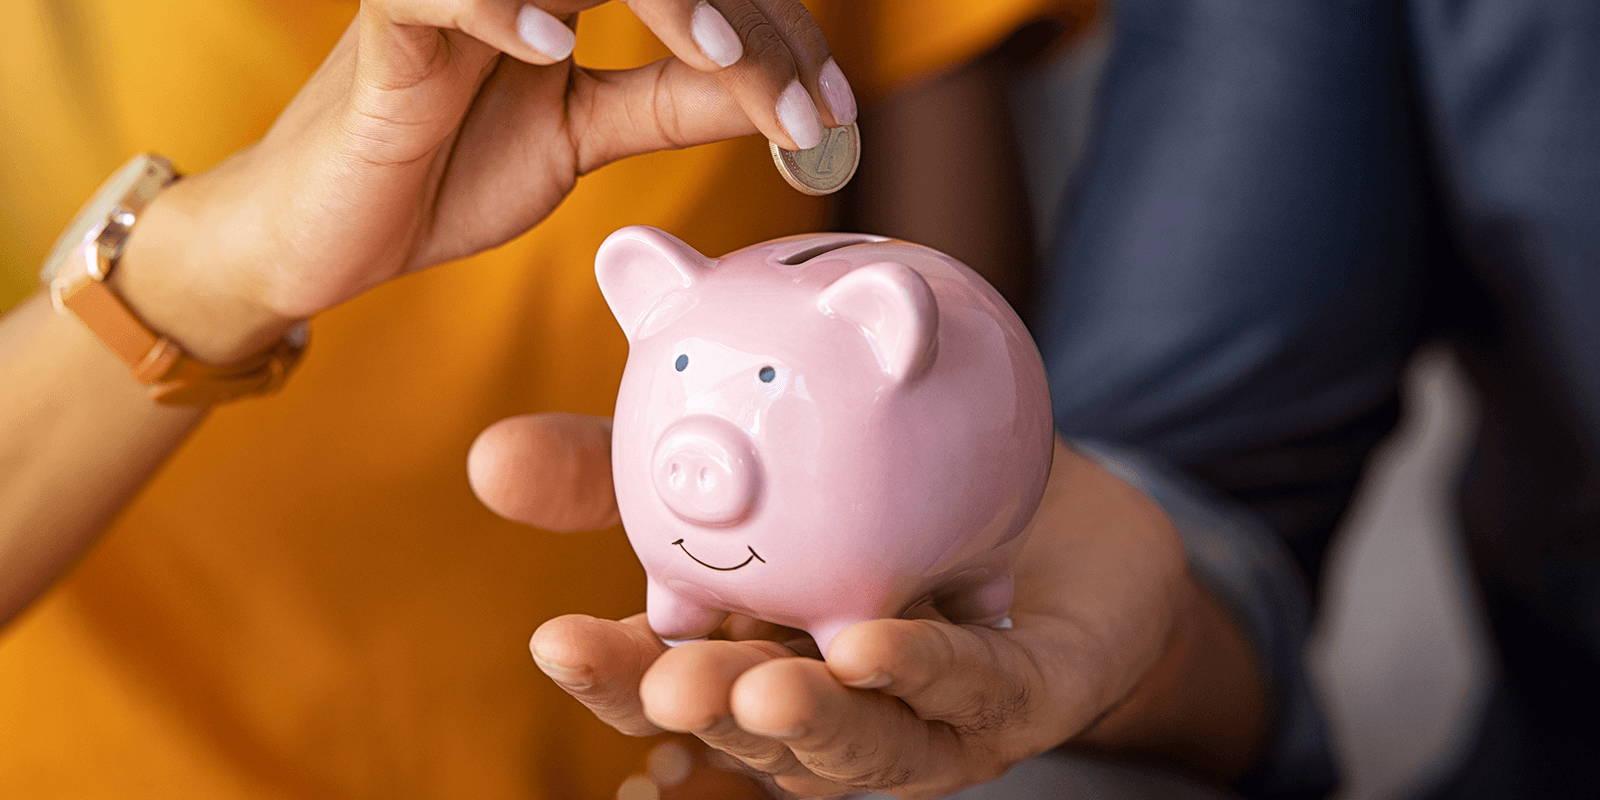 Close up of a couple putting a quarter in a piggy bank.